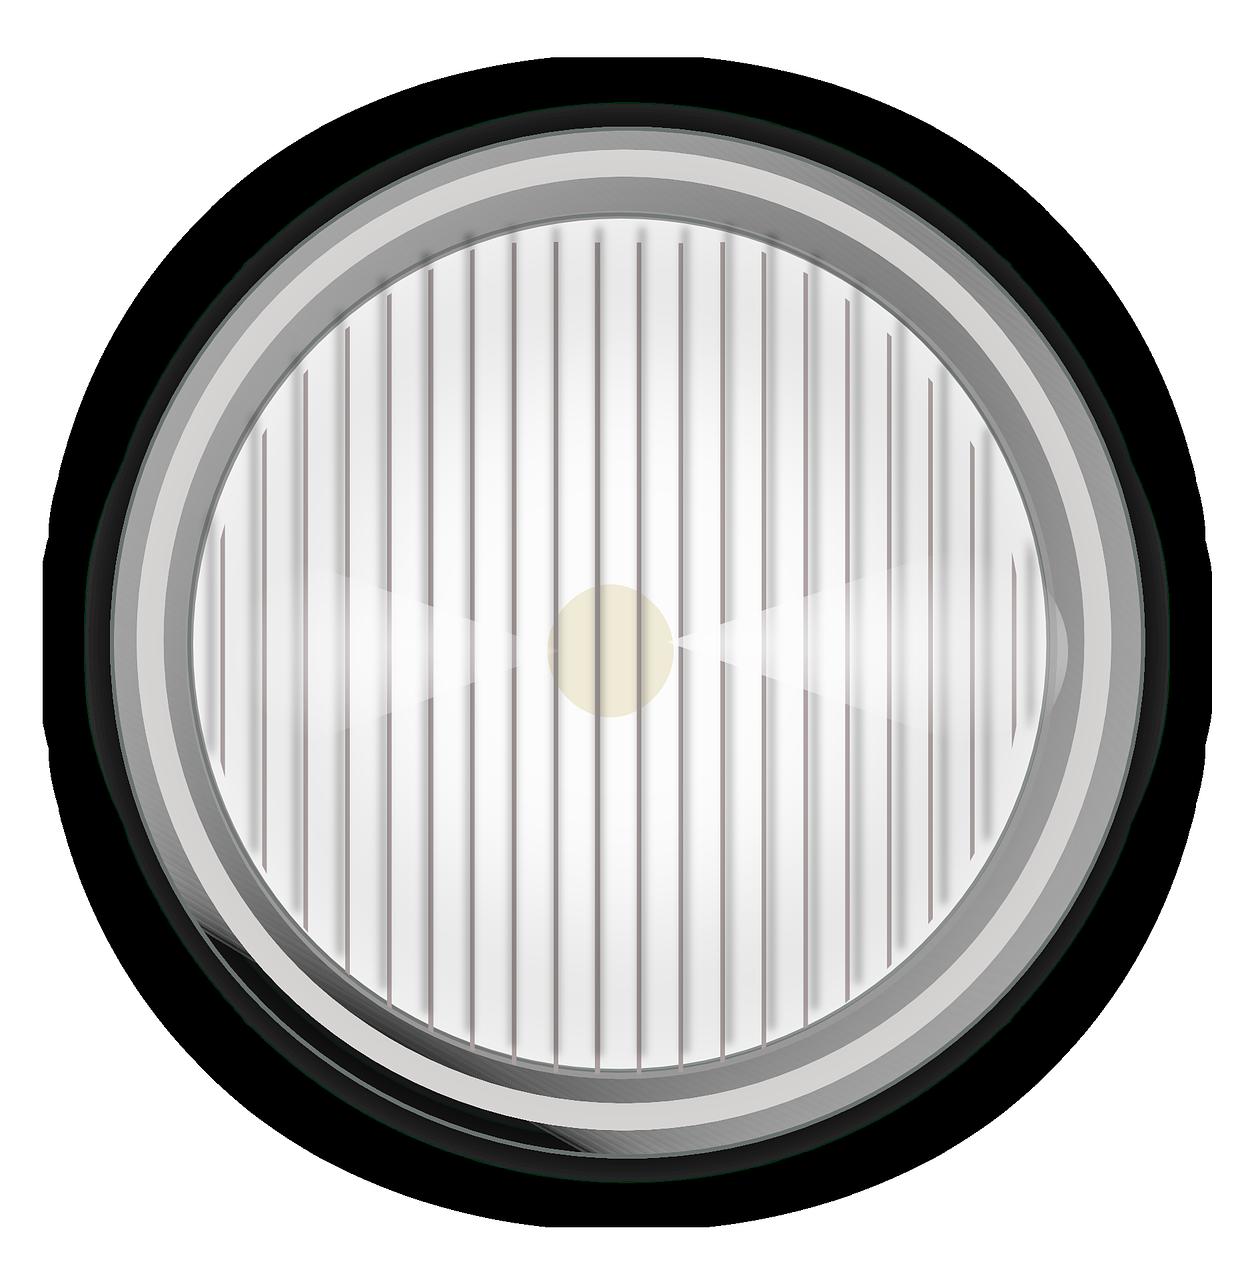 Spotlight automotive png image. Clipart cars headlight